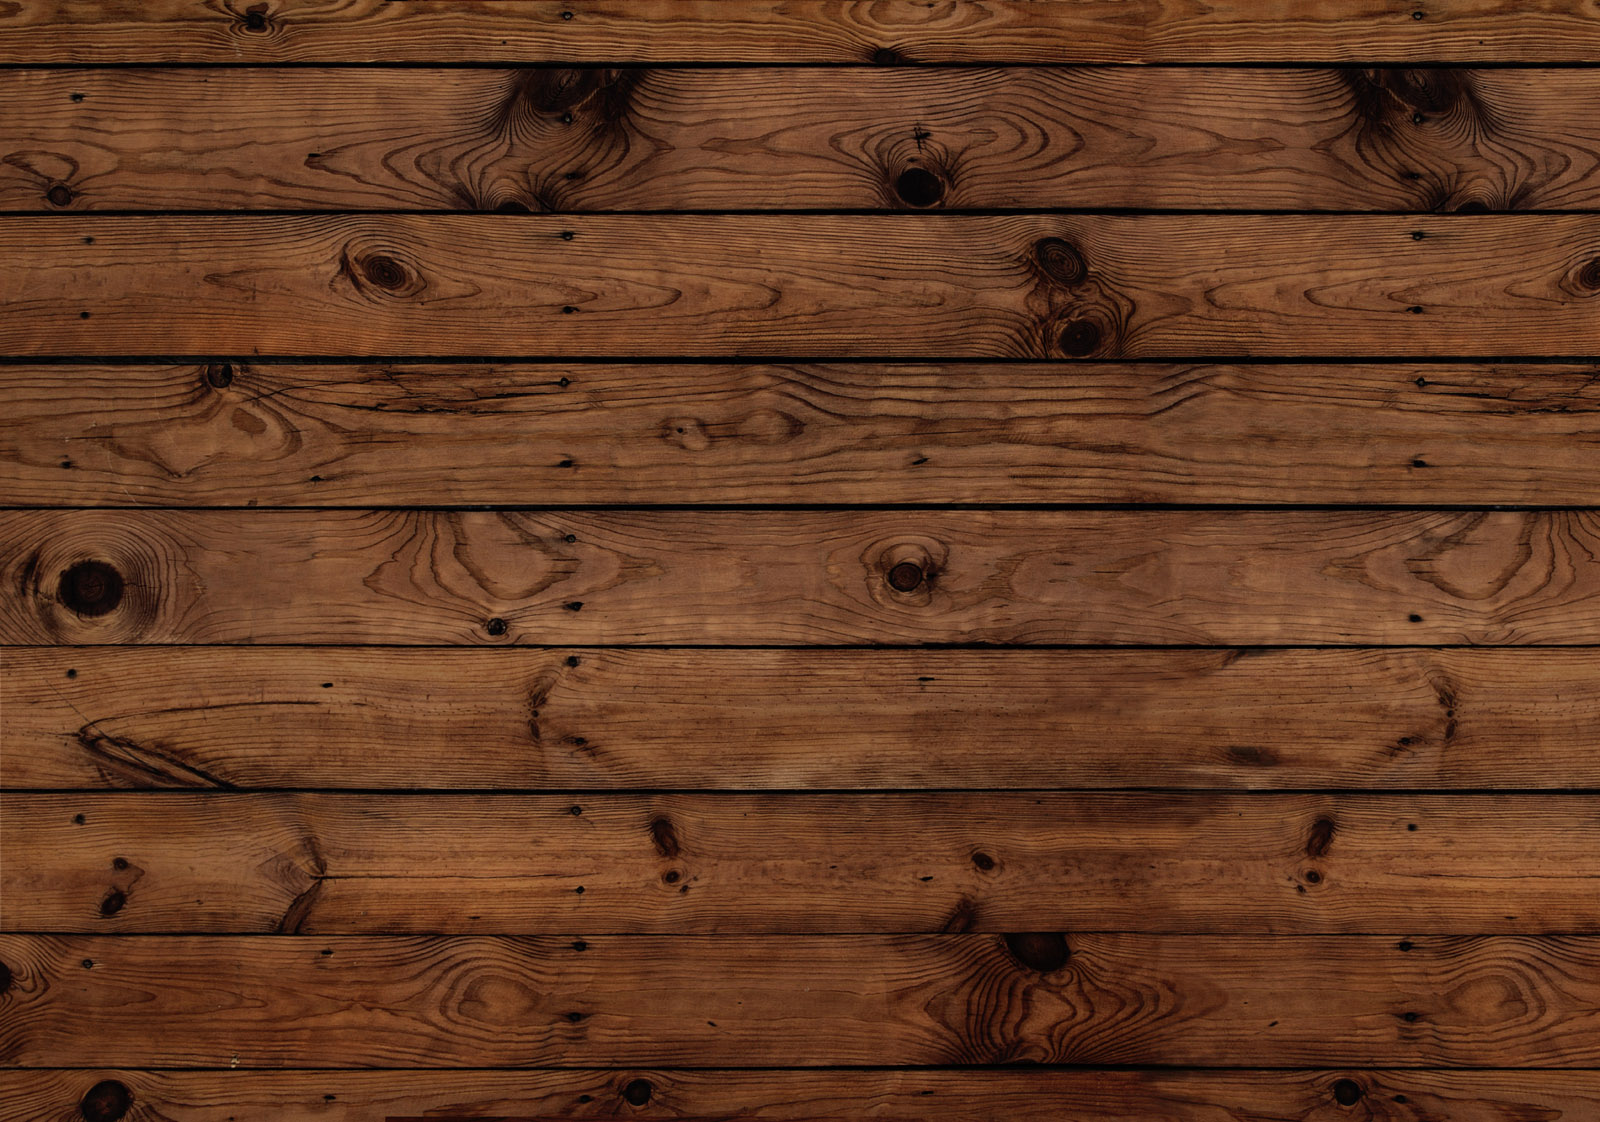 Old wood plank wallpaper wallpapersafari - Faux wood plank wallpaper ...